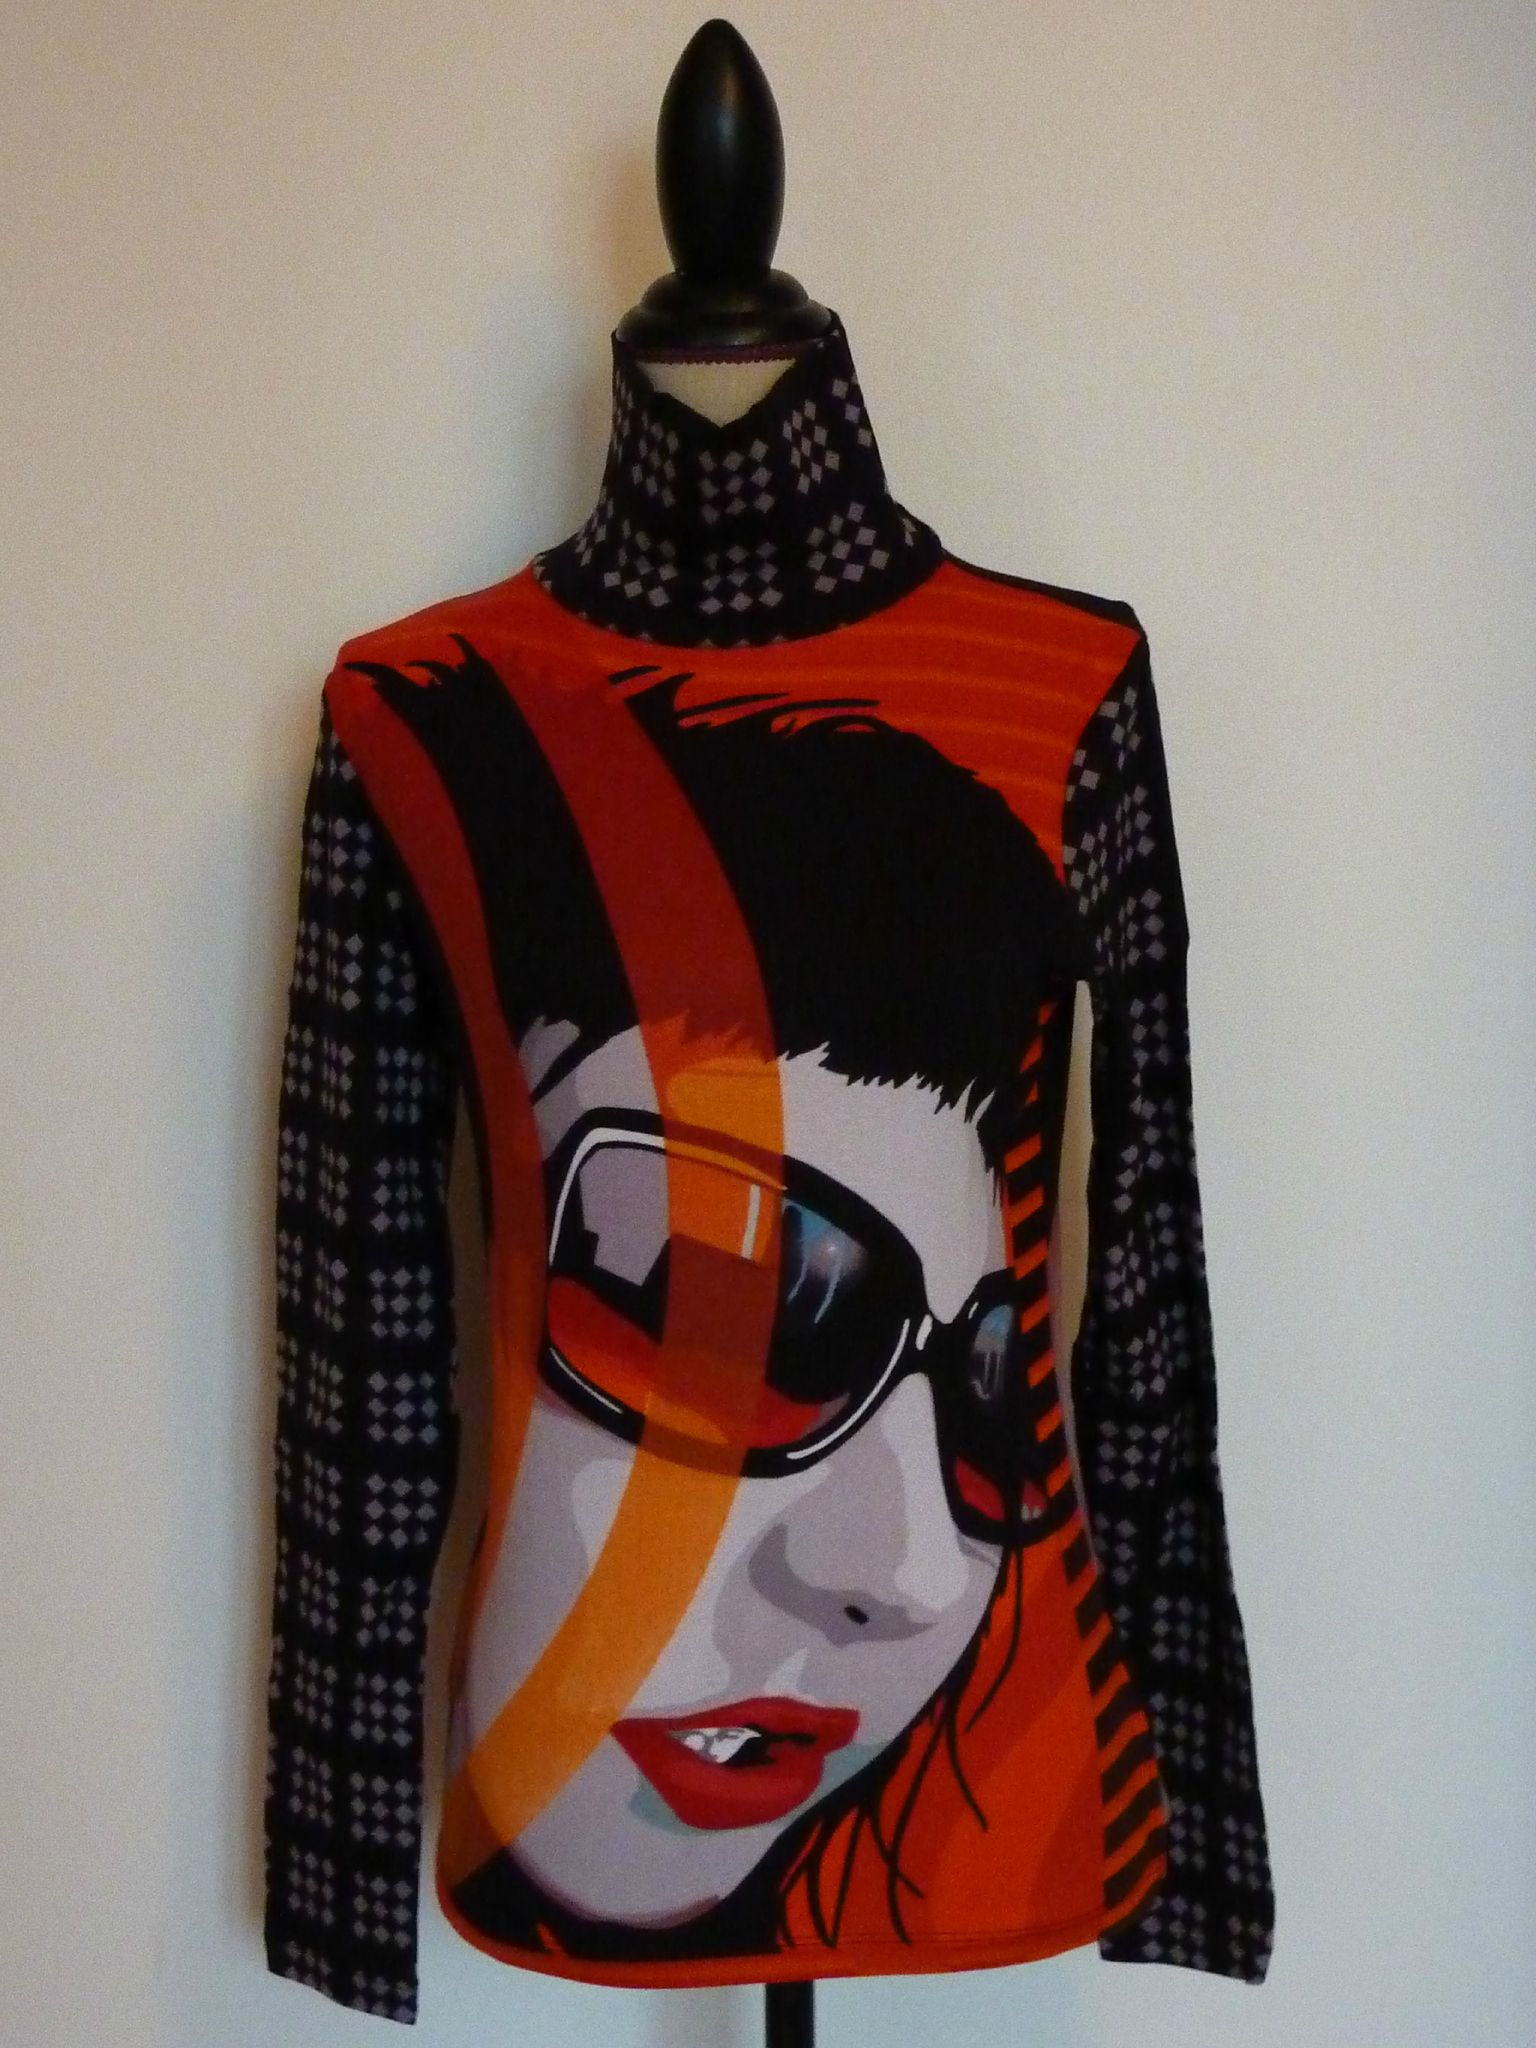 T-shirt manches longues CYBER Collection - Mirai Fashion - Taille 36 ou 38 - 20€ - originalite alliant excellente qualite